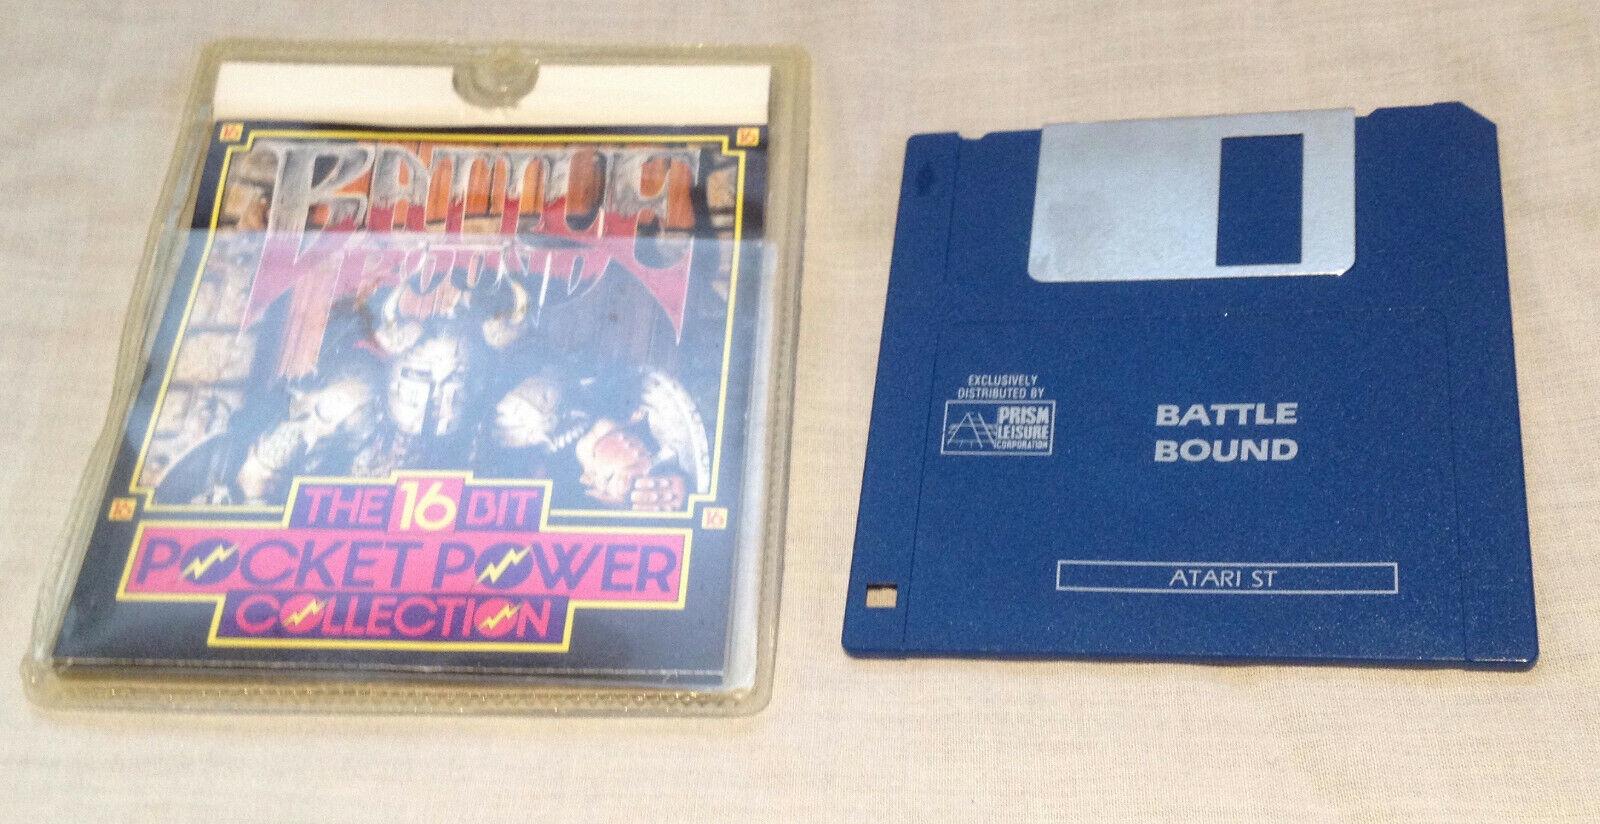 retro computer games - BATTLE BOUND Atari STe ST video computer game retro vintage